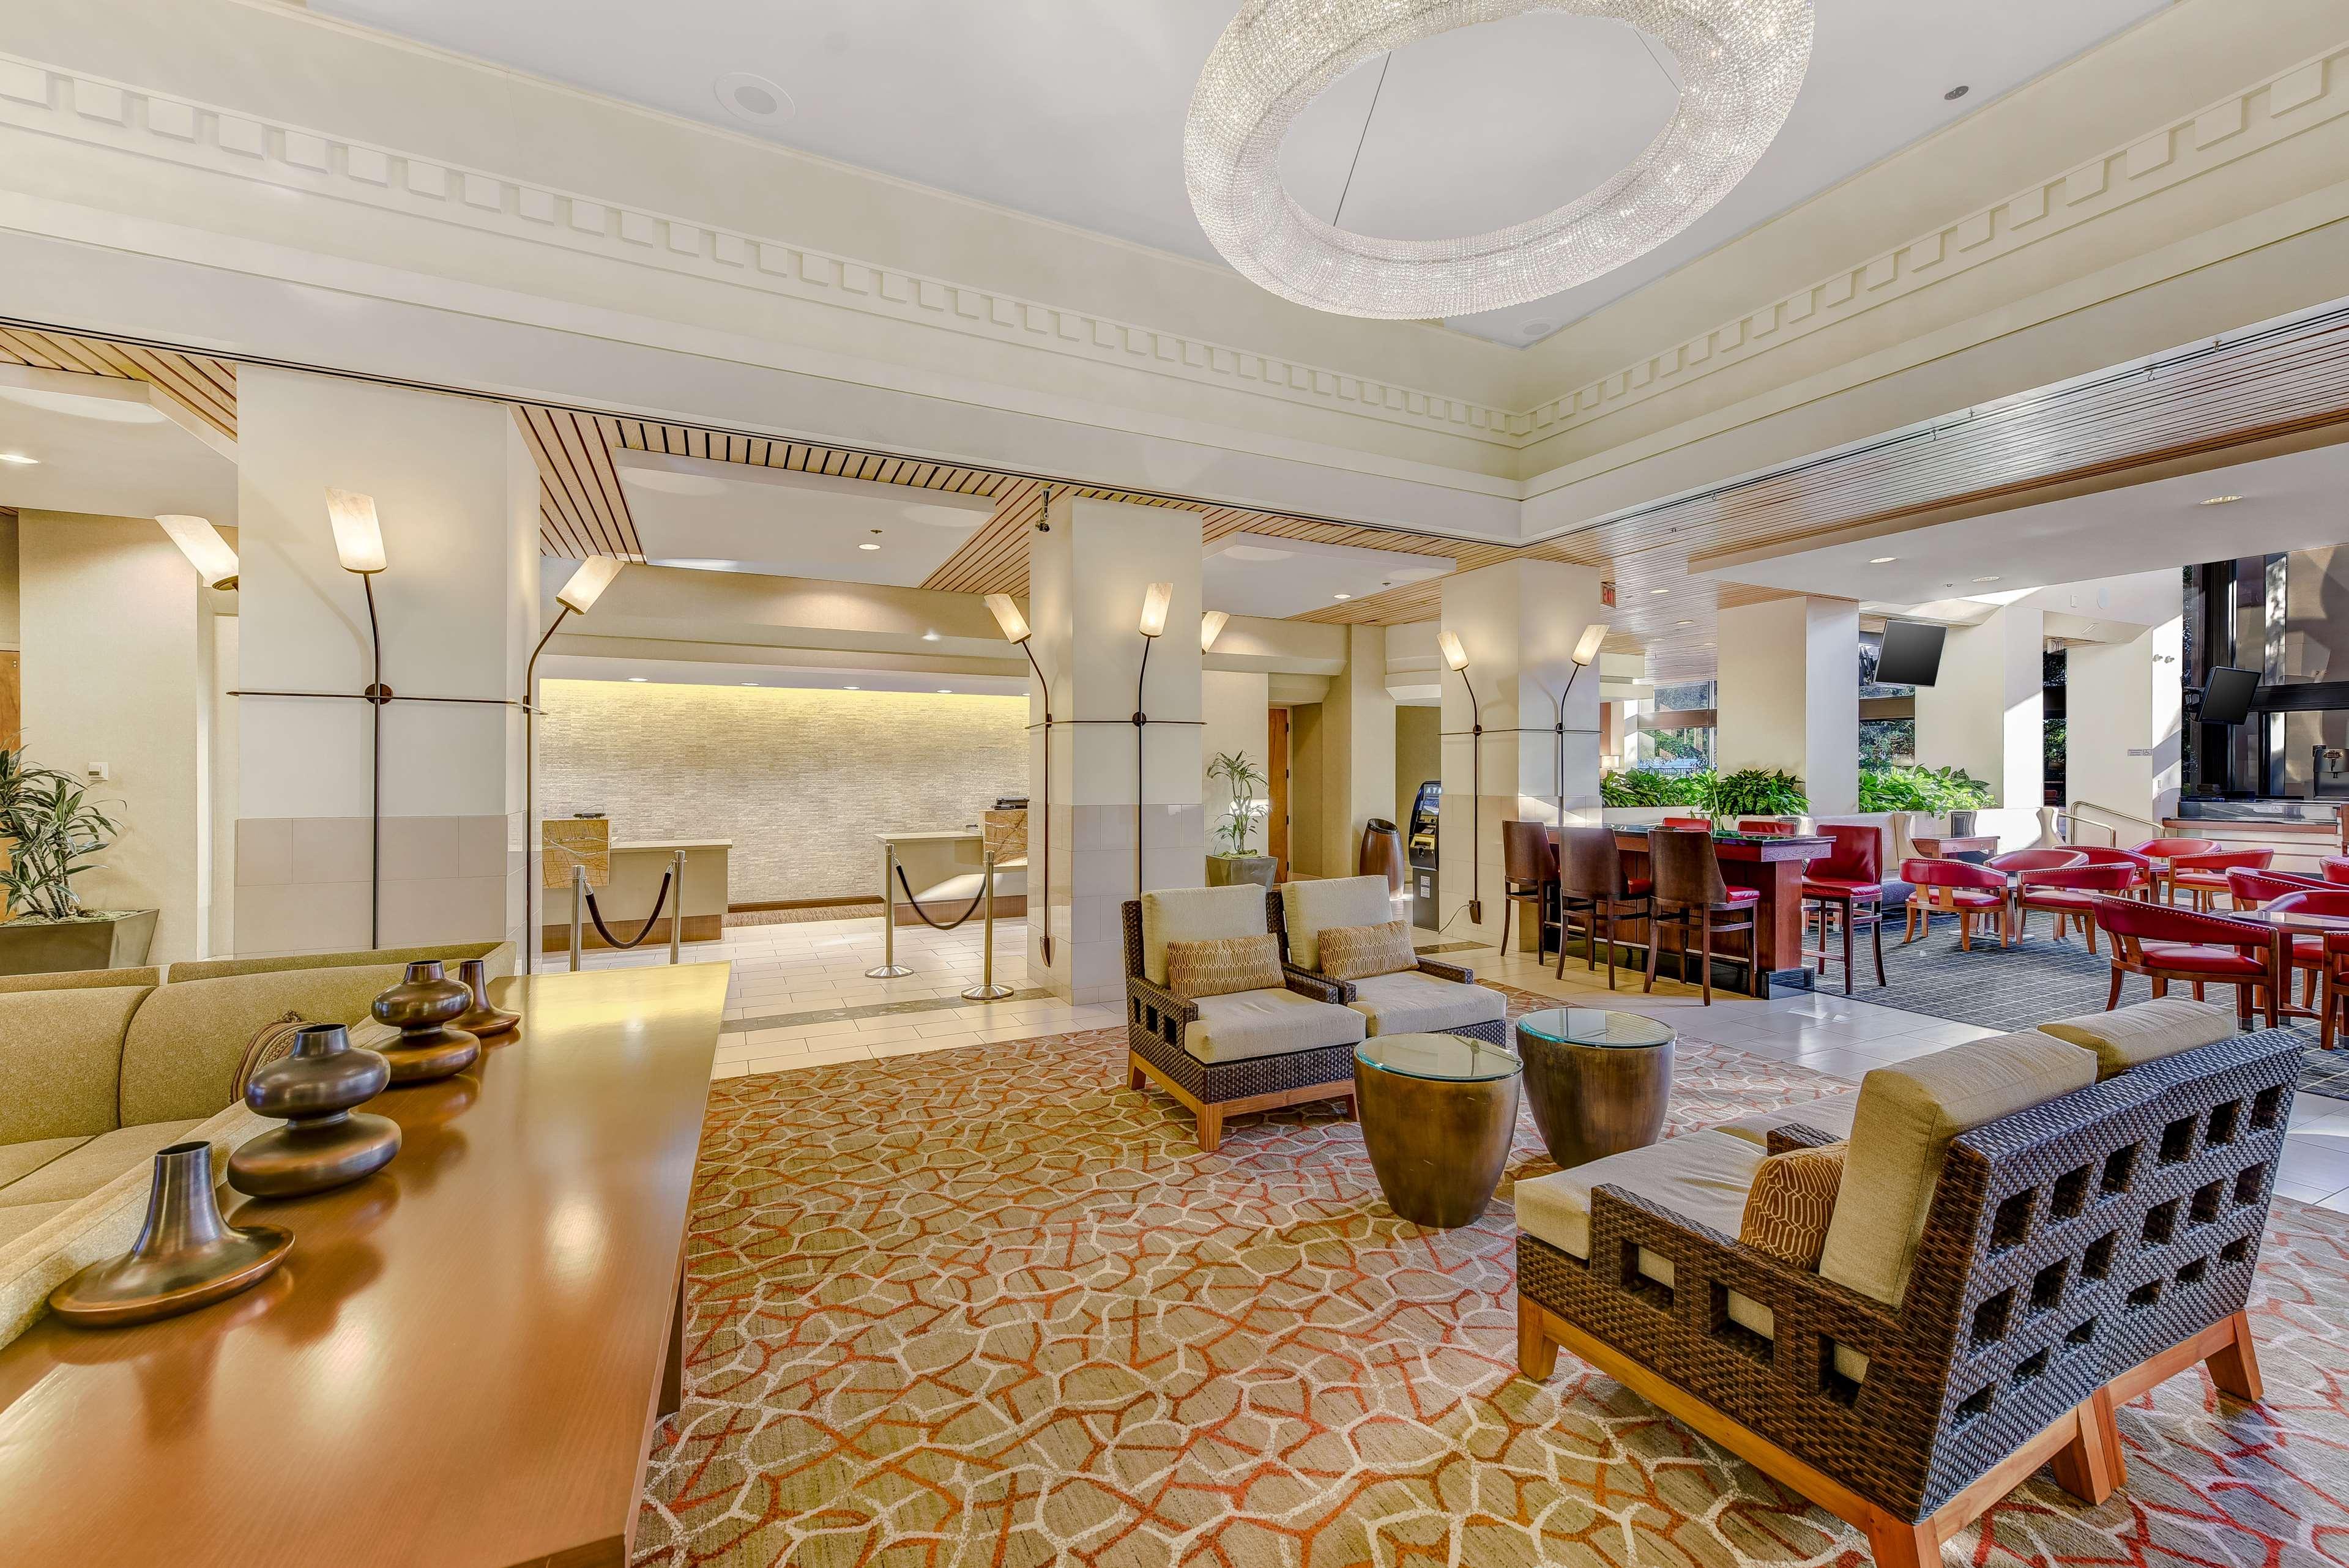 DoubleTree by Hilton Hotel Anaheim - Orange County image 15